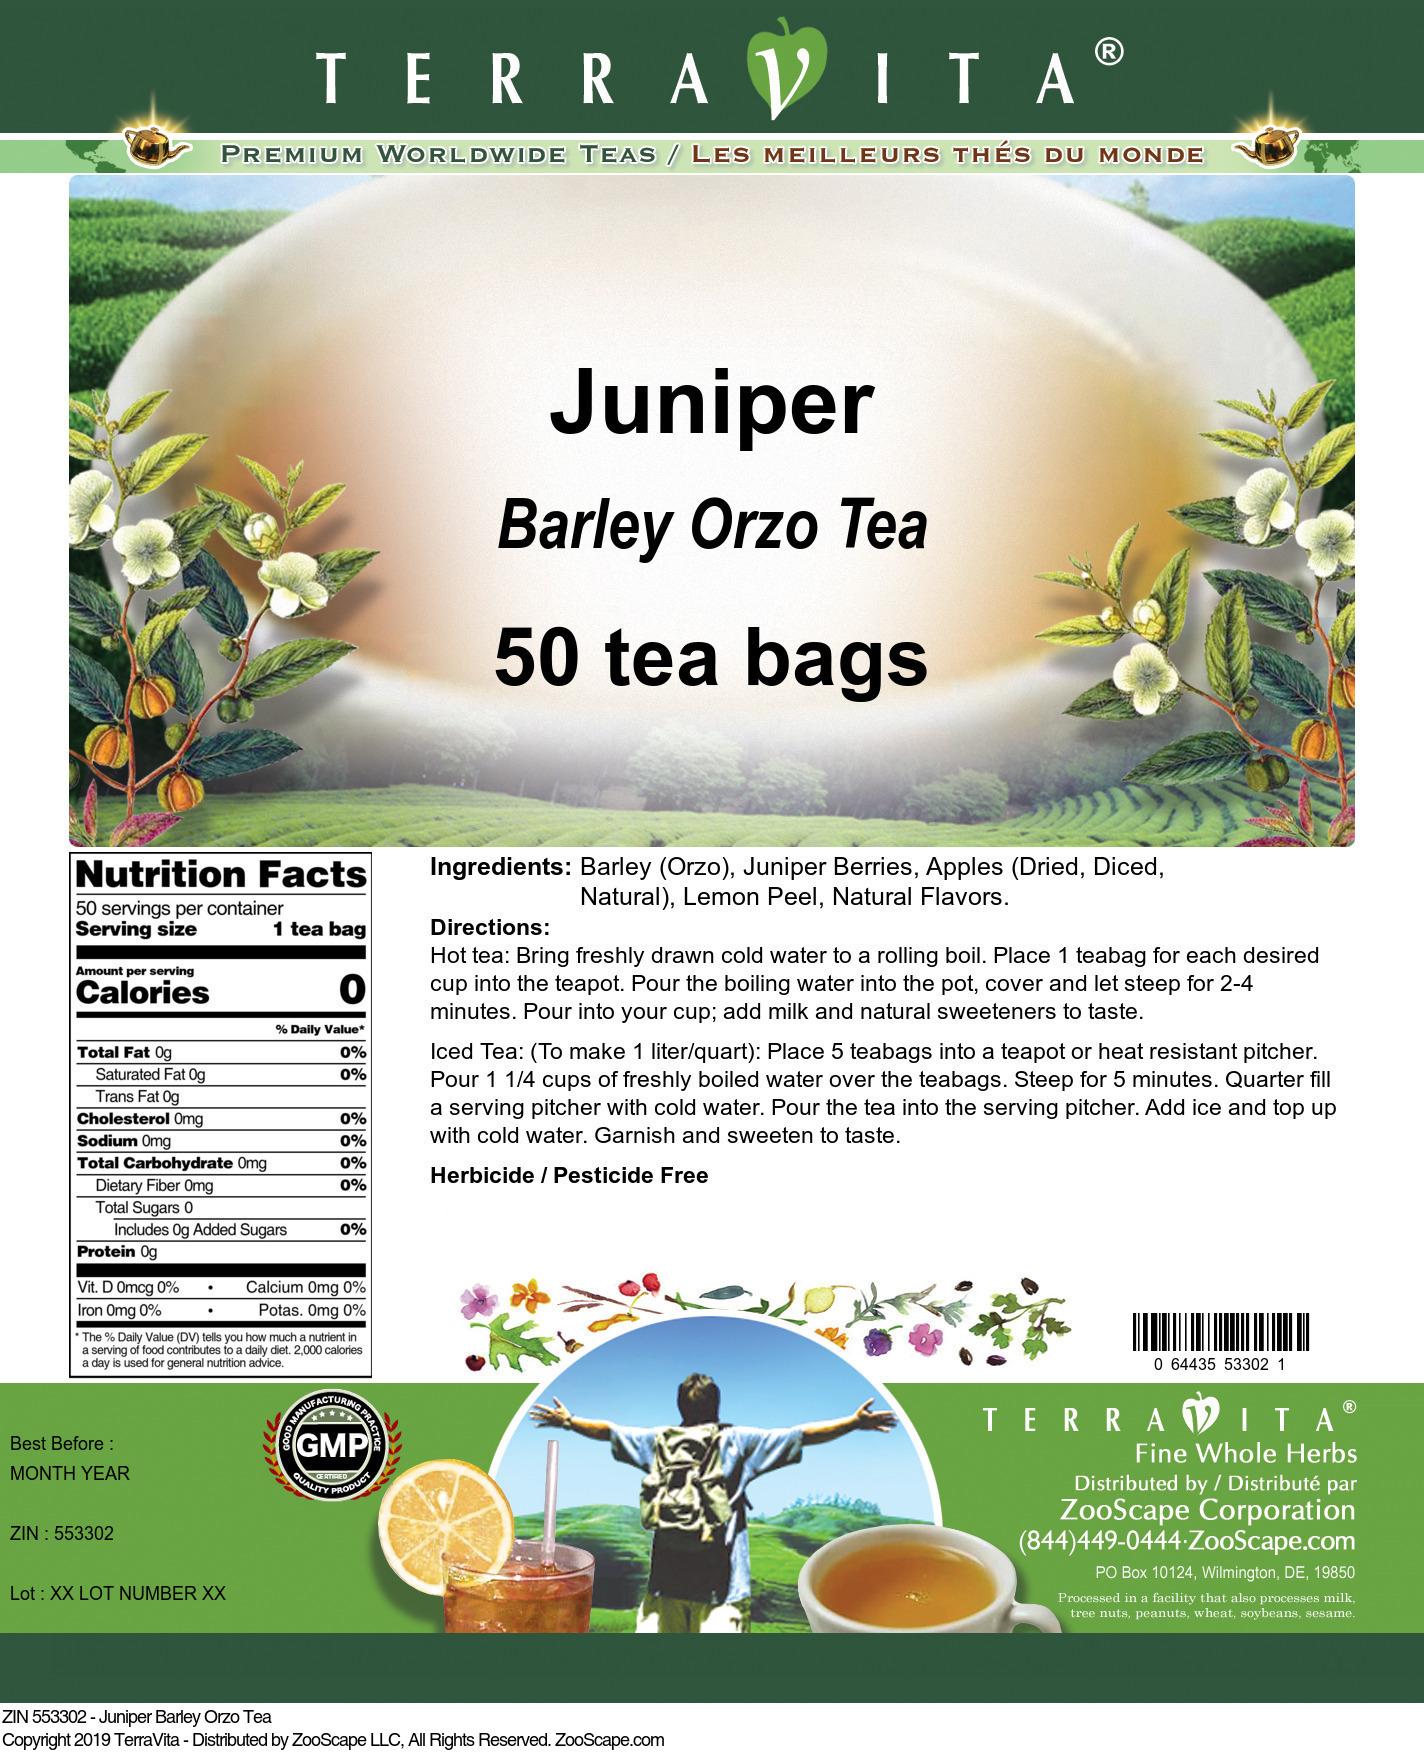 Juniper Barley Orzo Tea